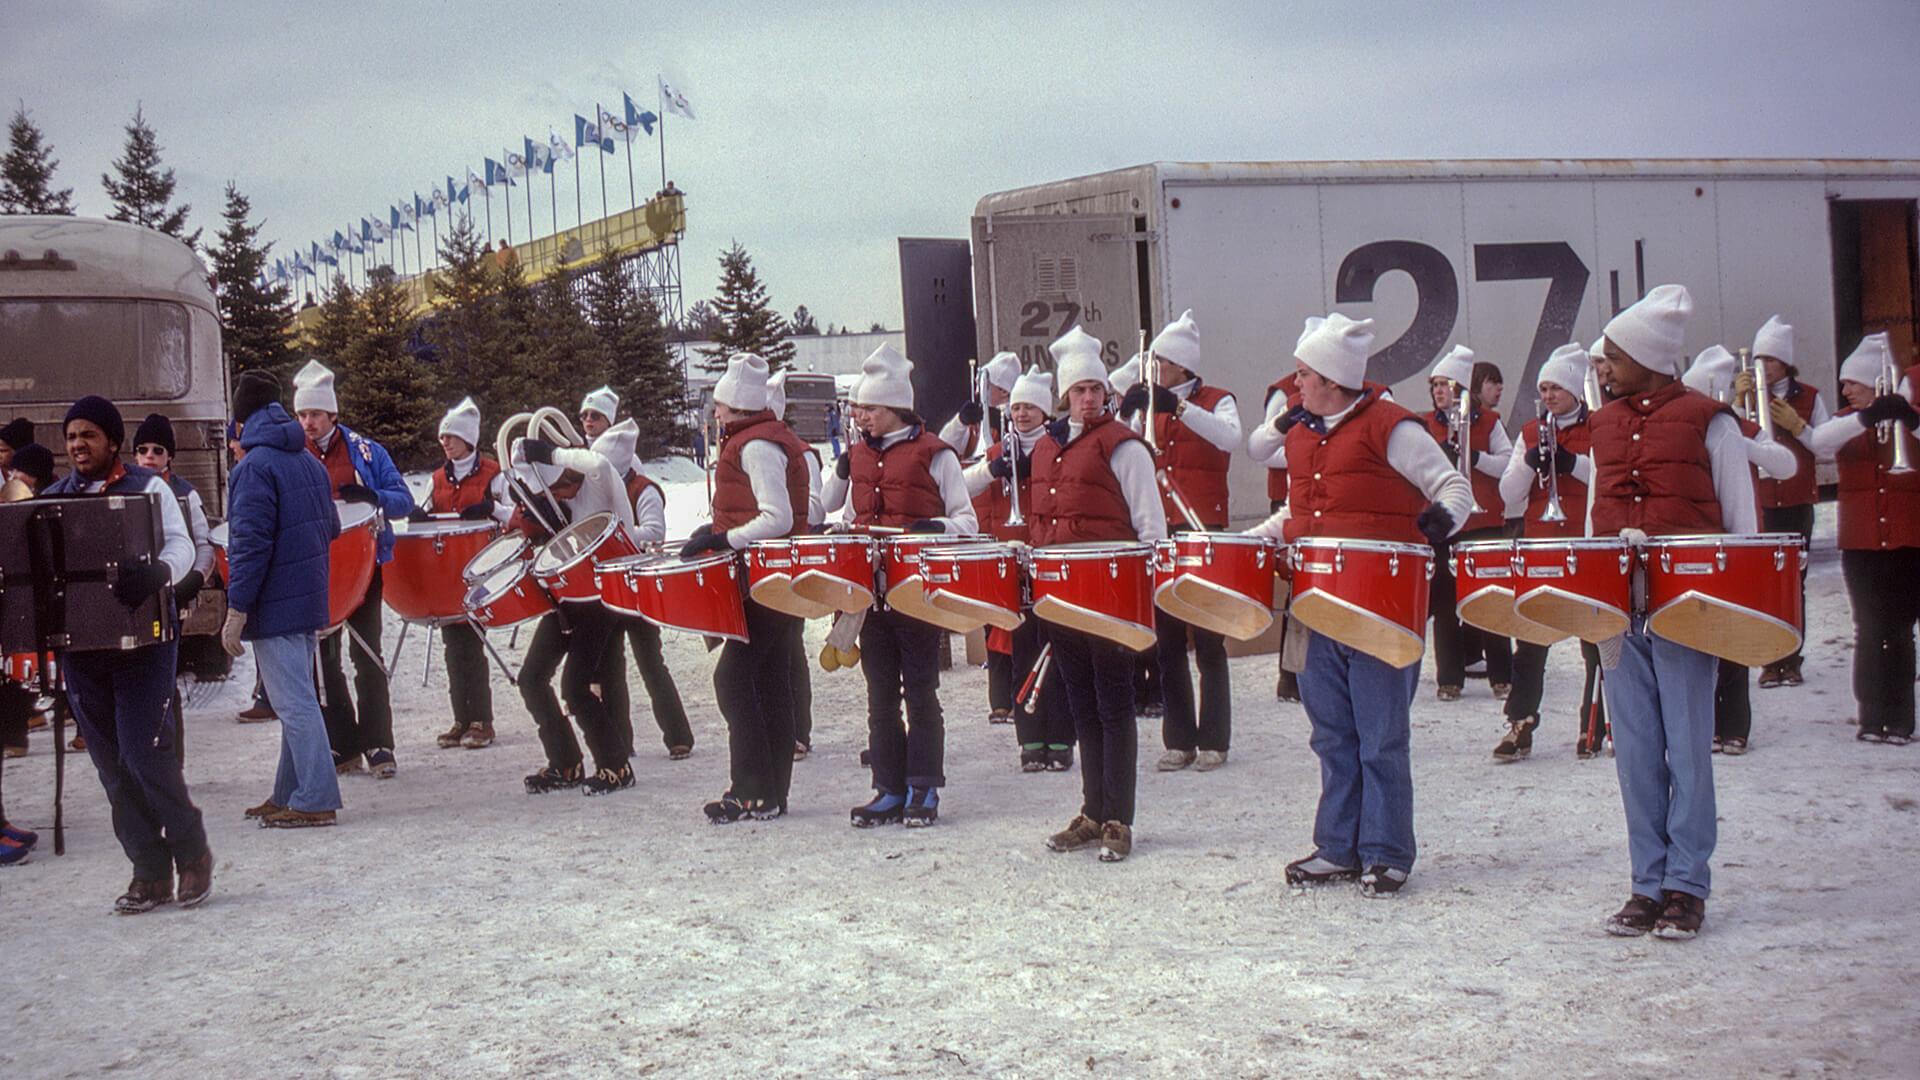 27th Lancers Olympics